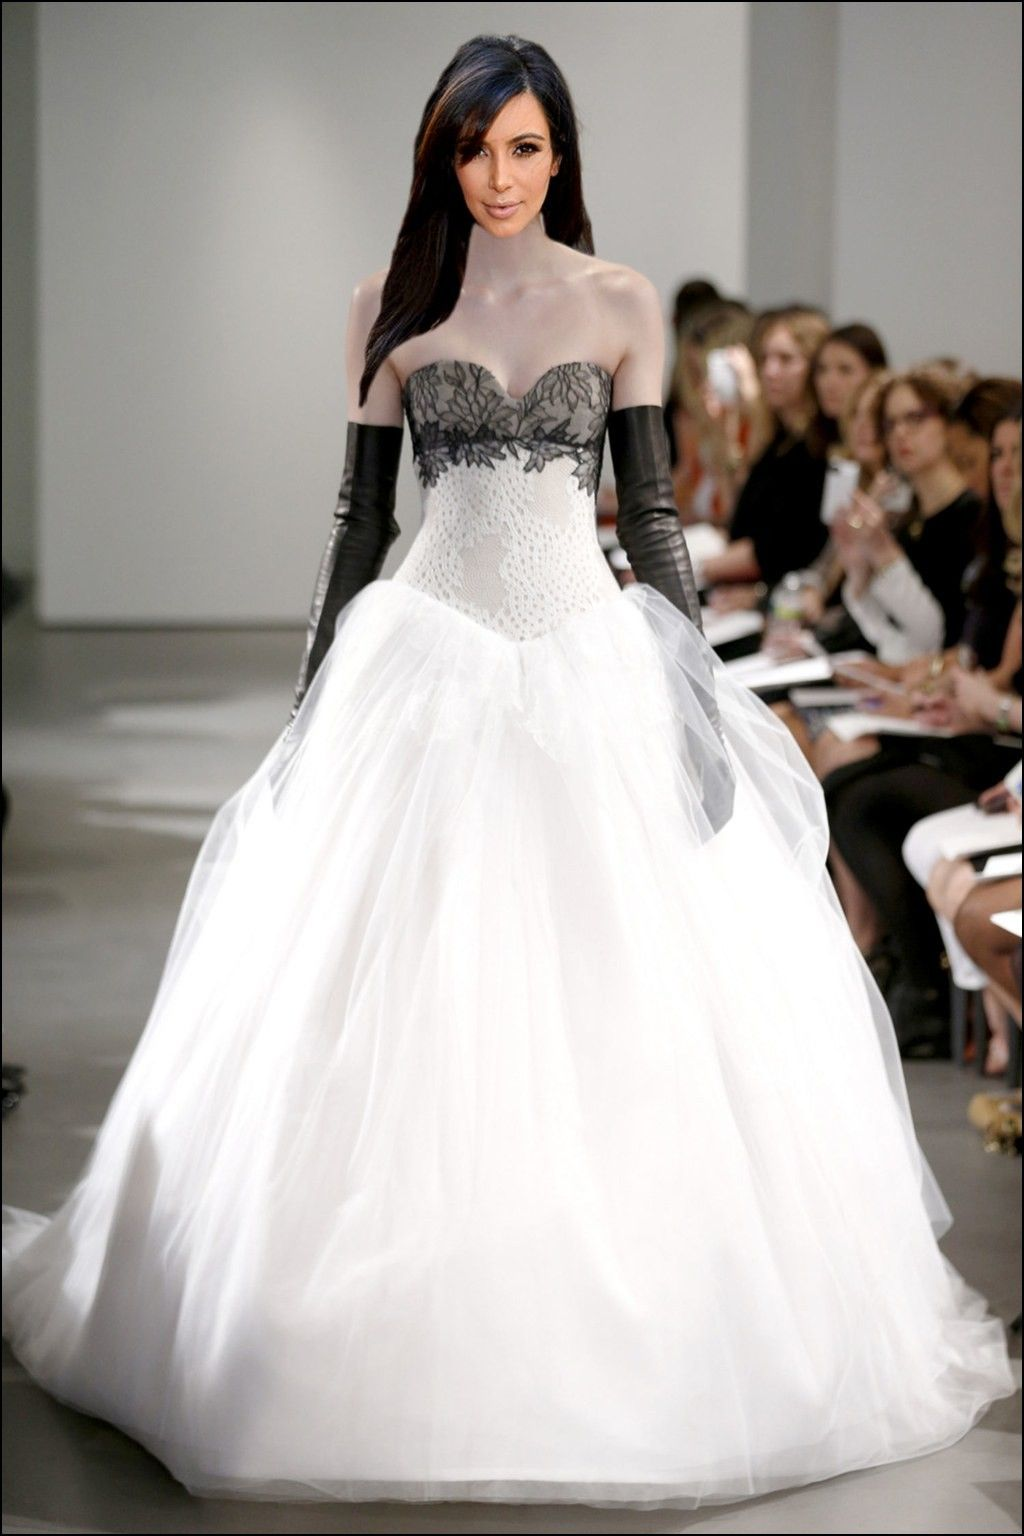 Kim kardasian wedding dress wedding ideas pinterest wedding kim kardashian wedding dress with kanye ombrellifo Image collections